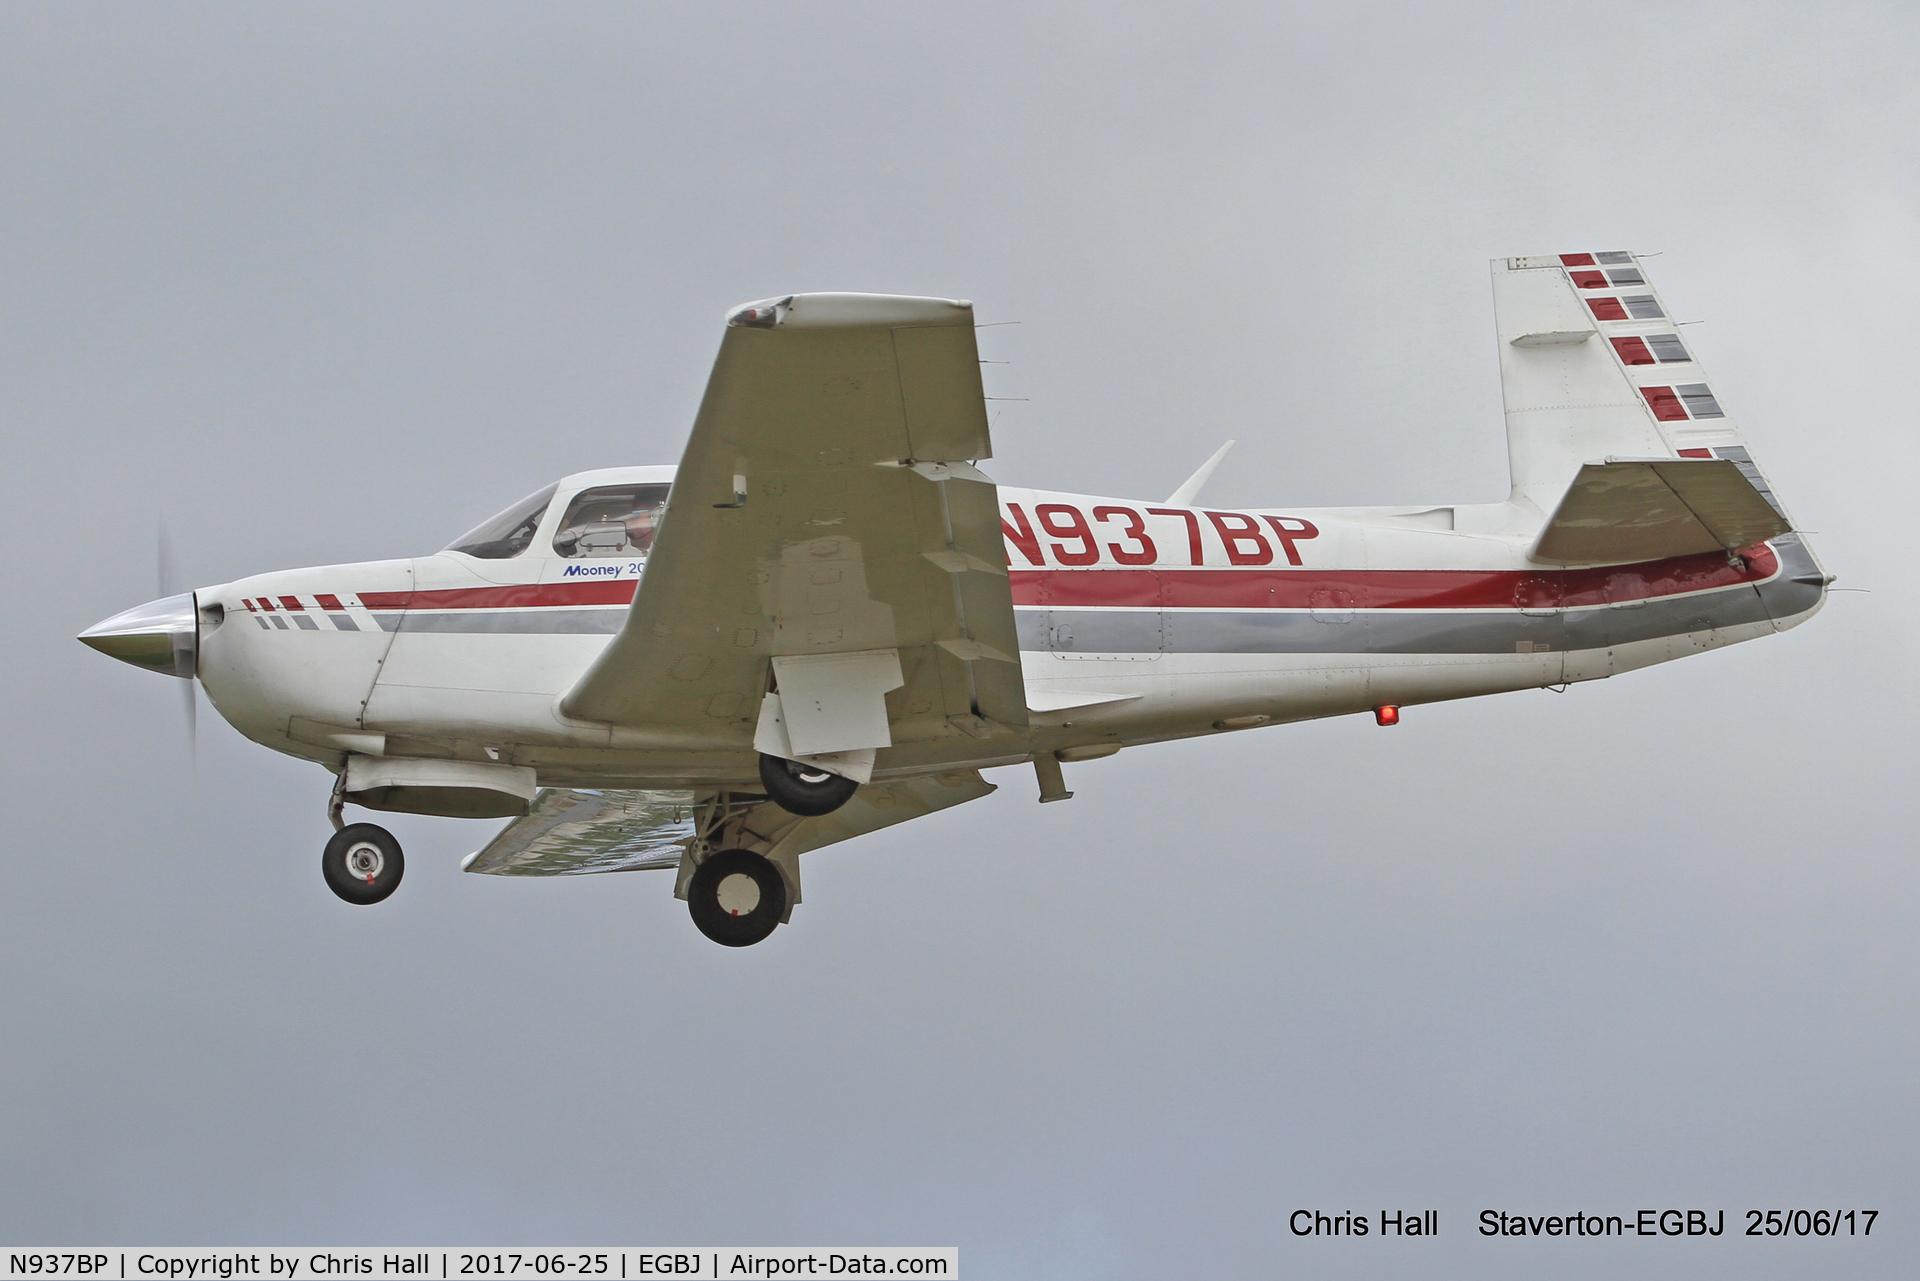 N937BP, 1987 Mooney M20J 201 C/N 24-3046, Project Propeller at Staverton